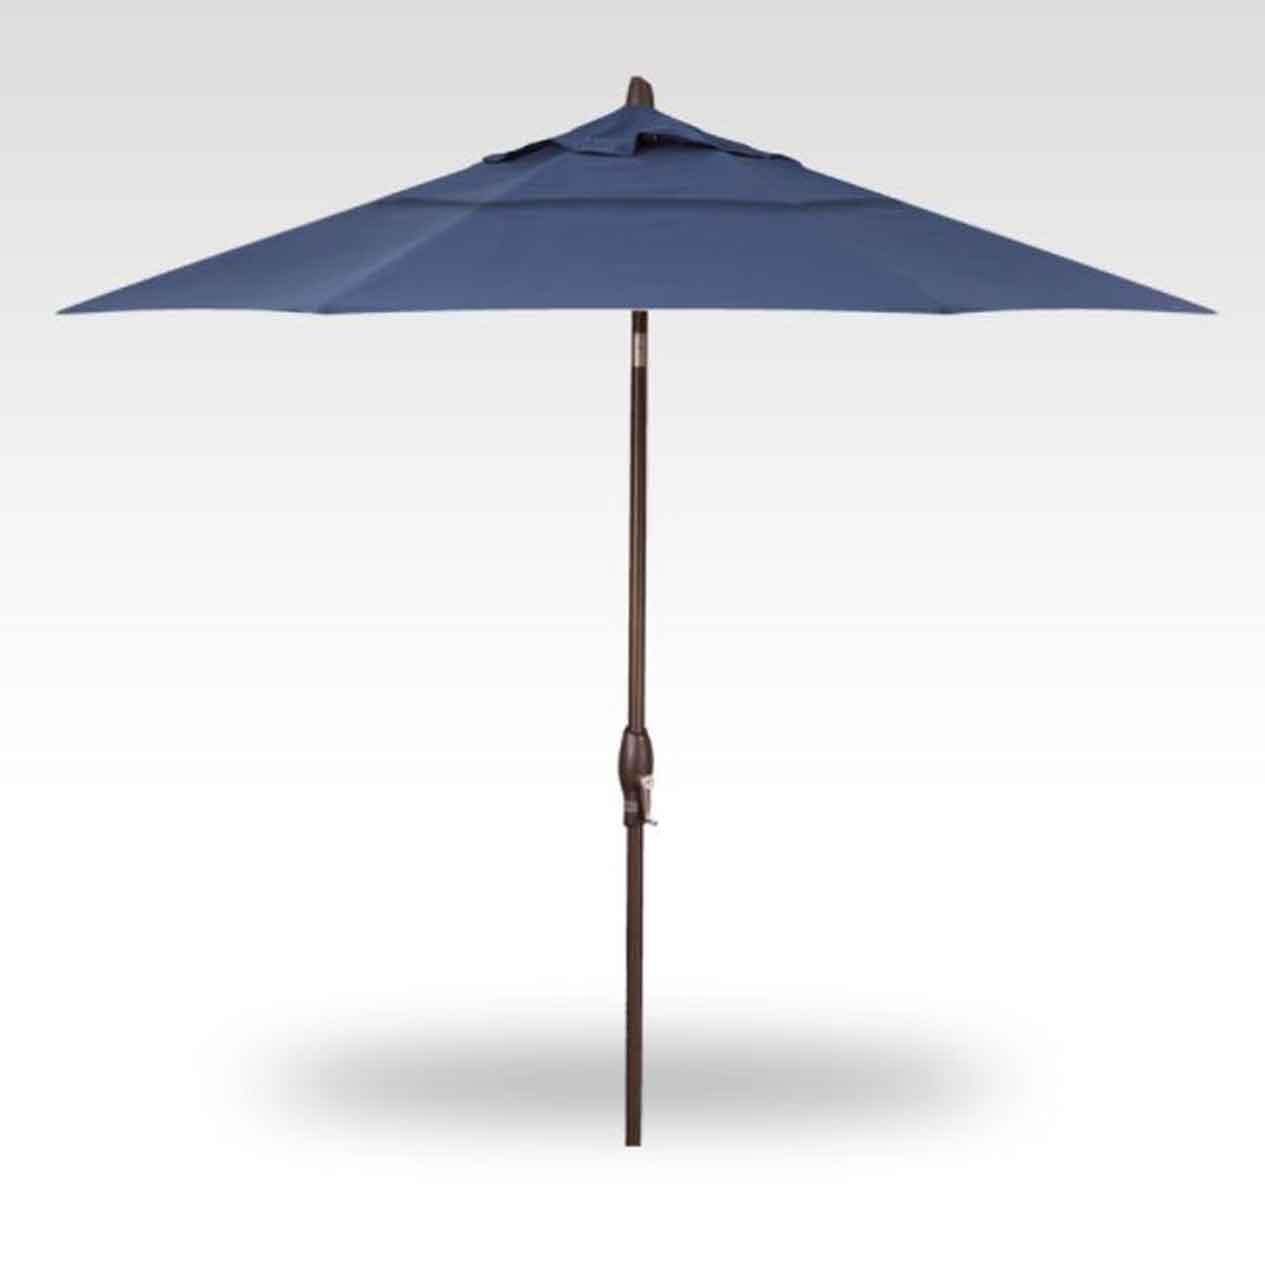 9' Auto Tilt Market Umbrella - Neptune